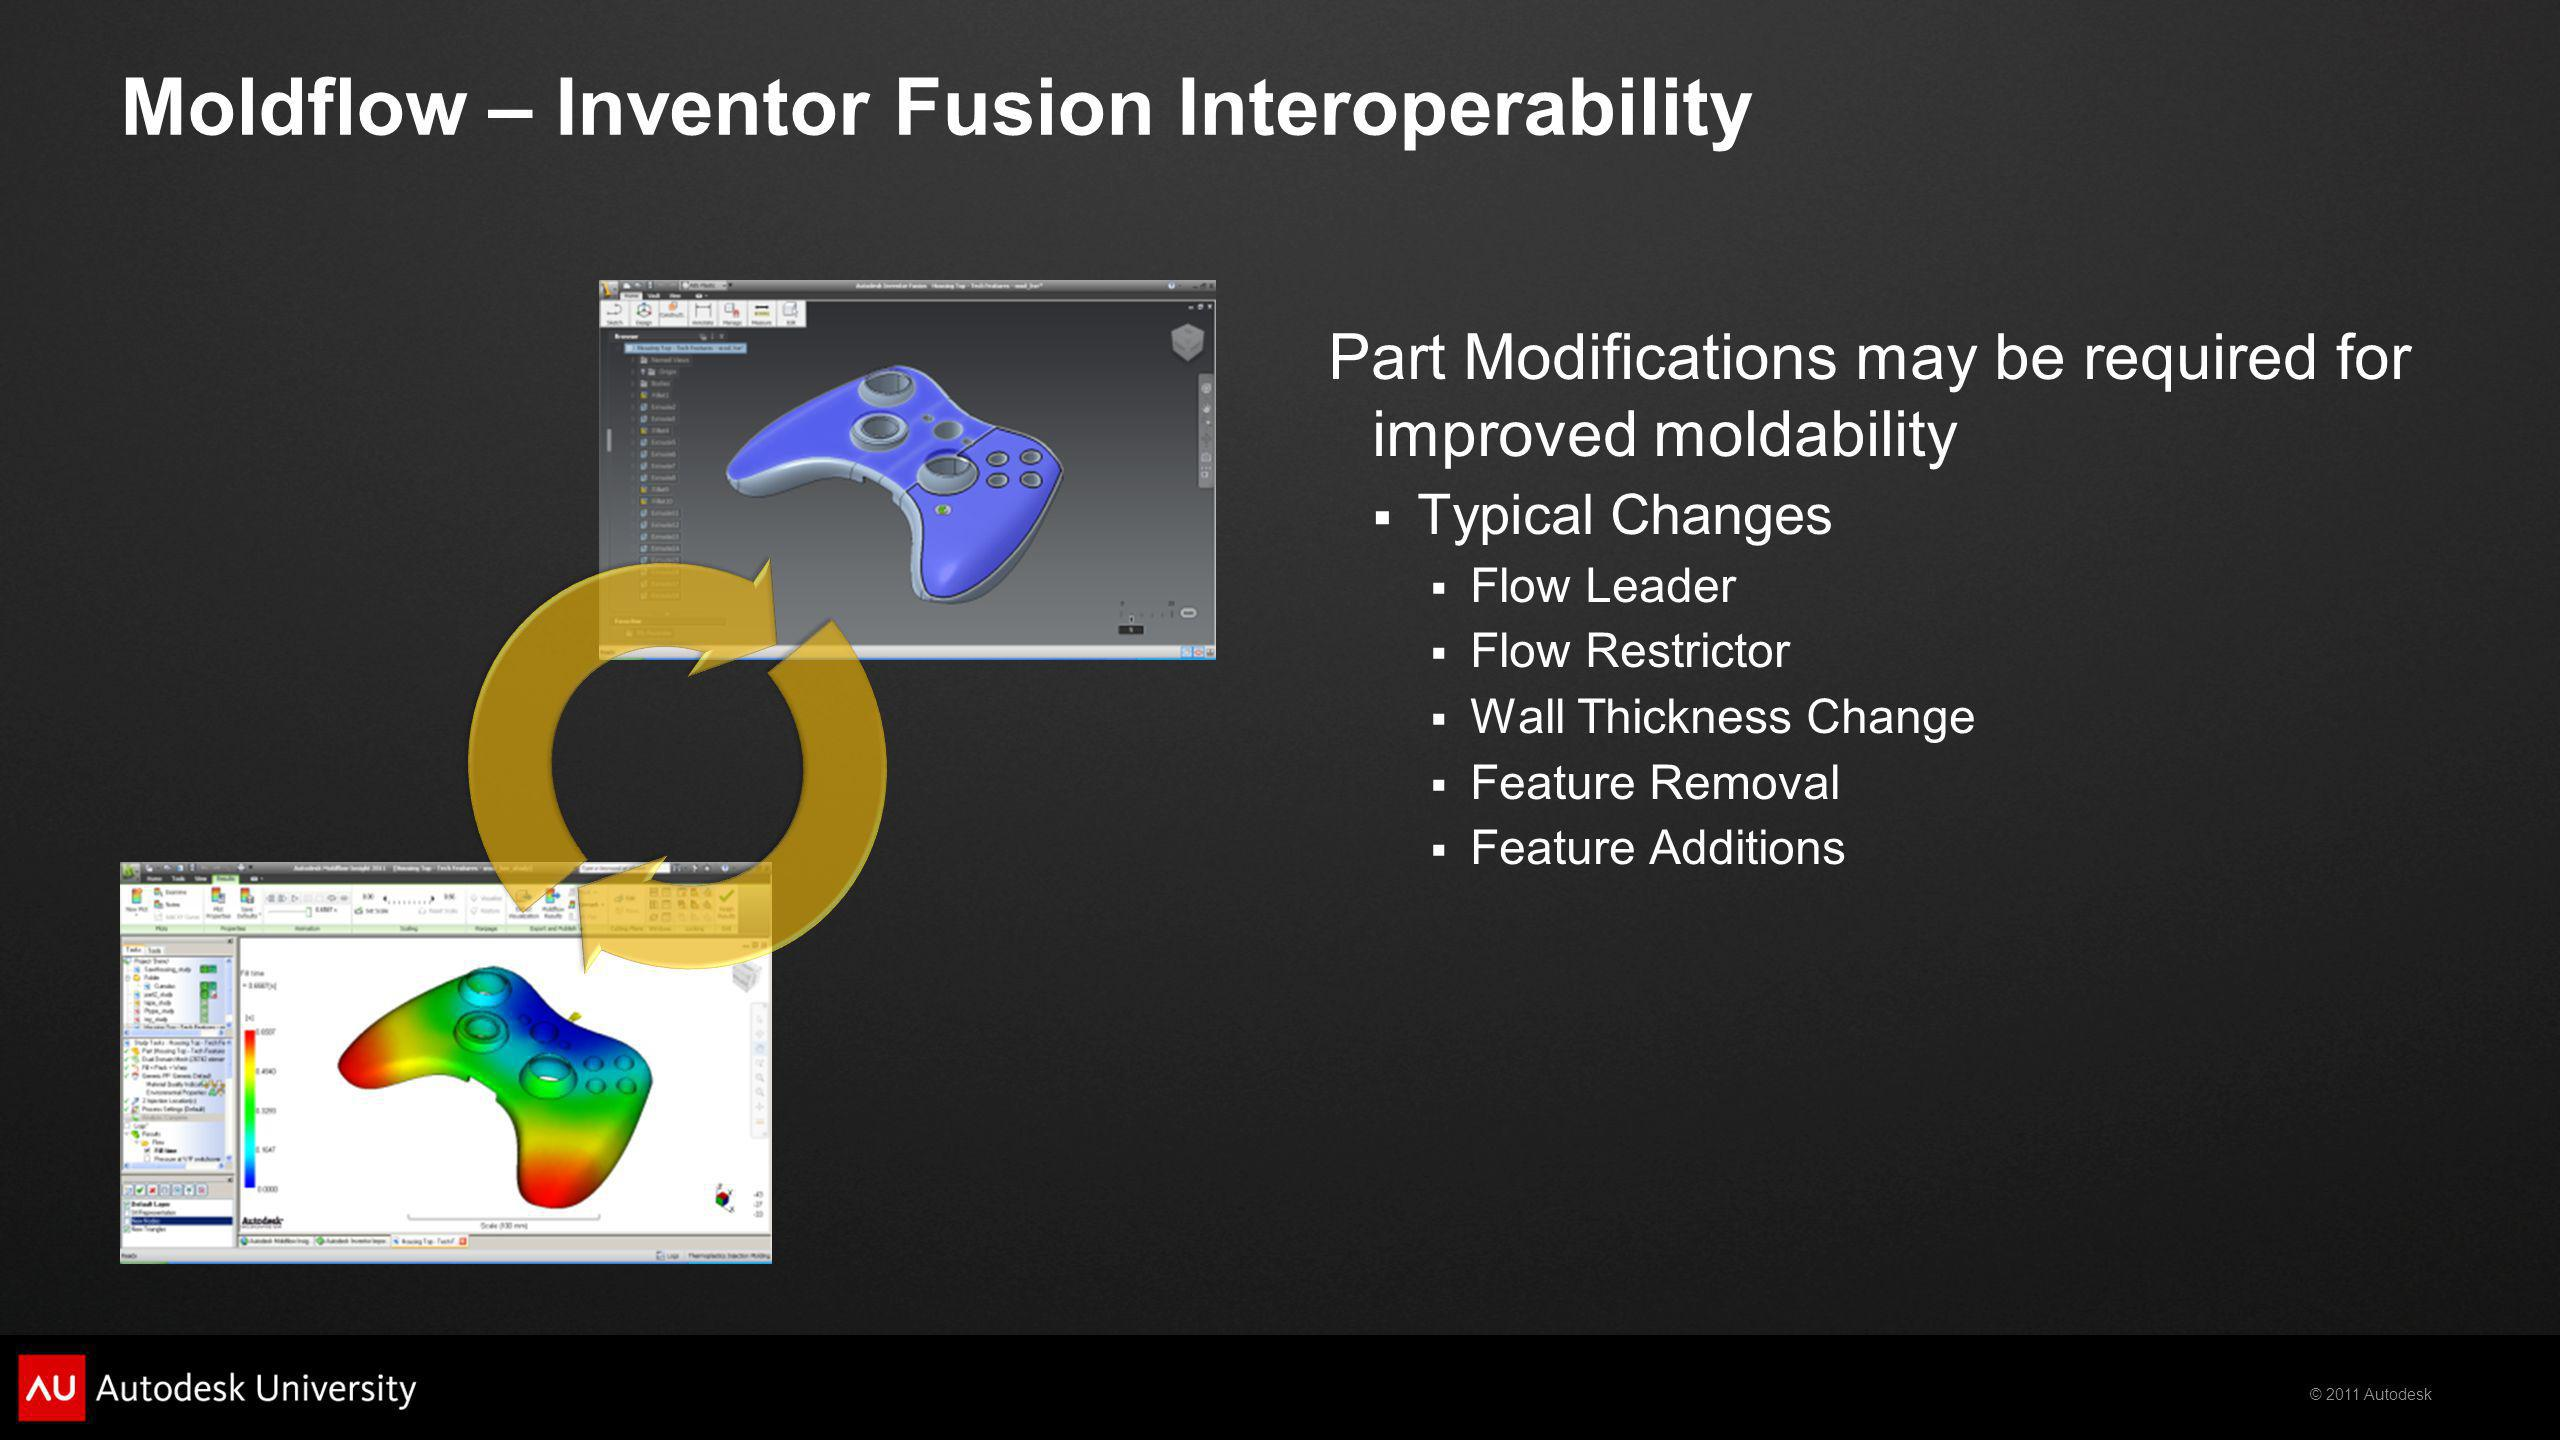 Moldflow – Inventor Fusion Interoperability